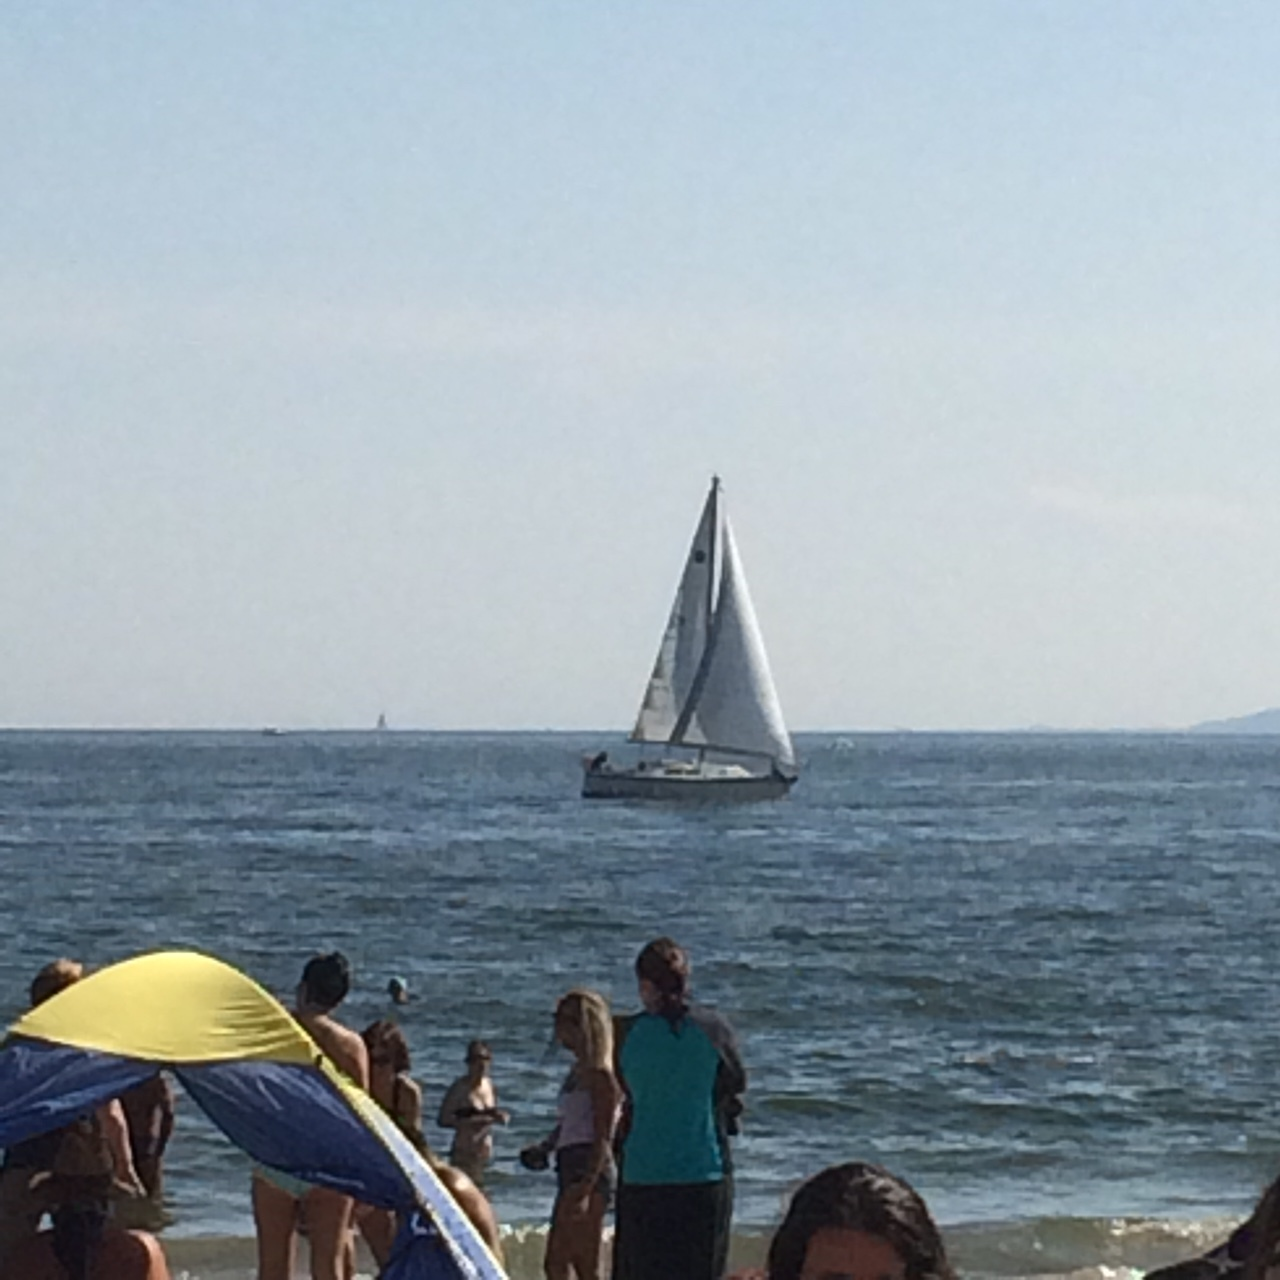 9/4/17 Brighton Beach Brooklyn. Enjoy sunshine with SABIT tank top & short.Beautiful day on the beach.